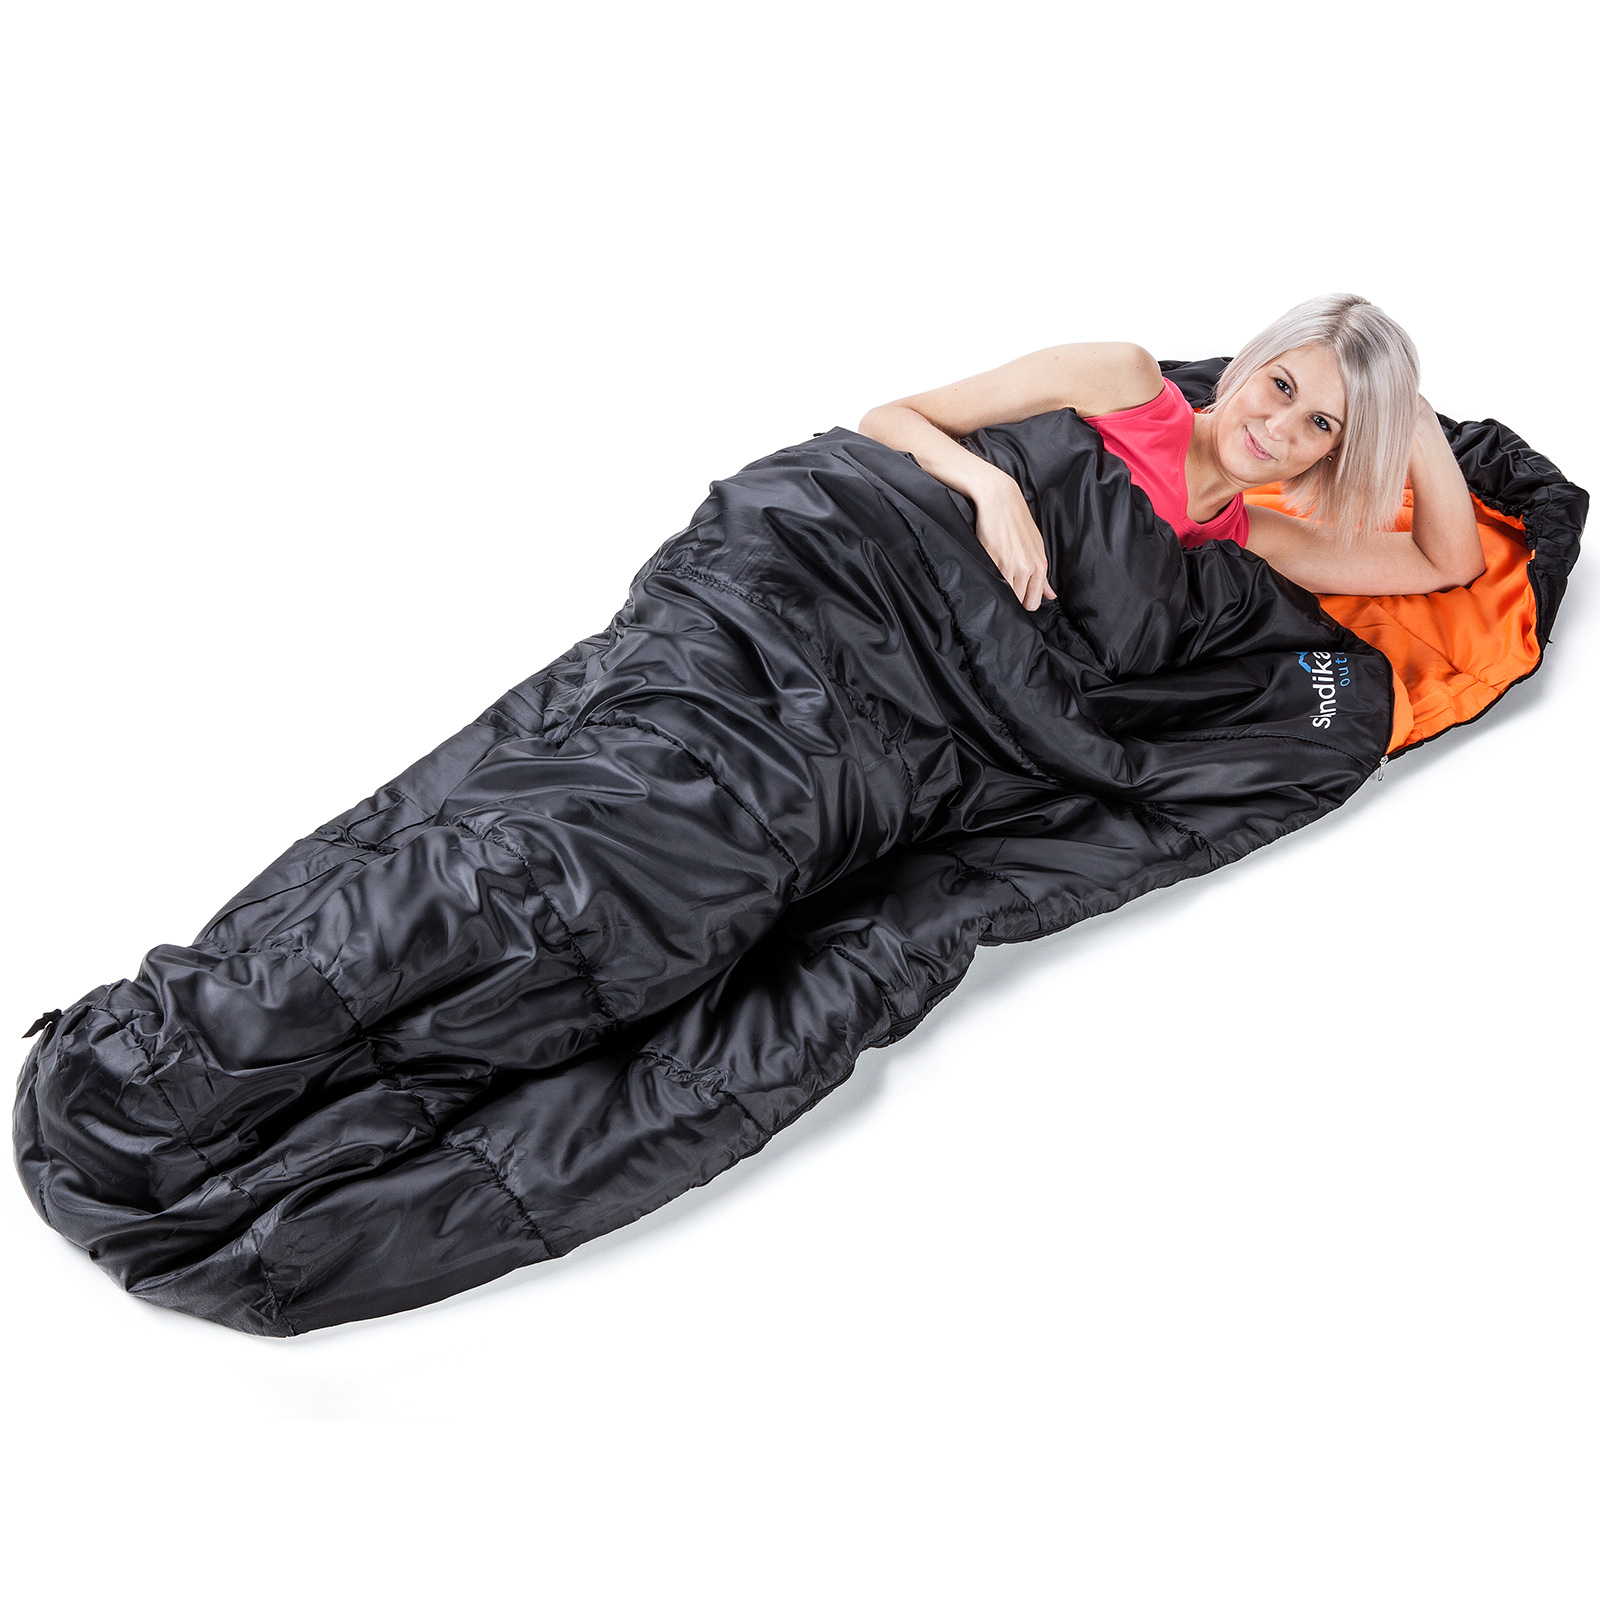 SKANDIKA VEGAS SLEEPING POD XXL BLACK SLEEPING BAG ...